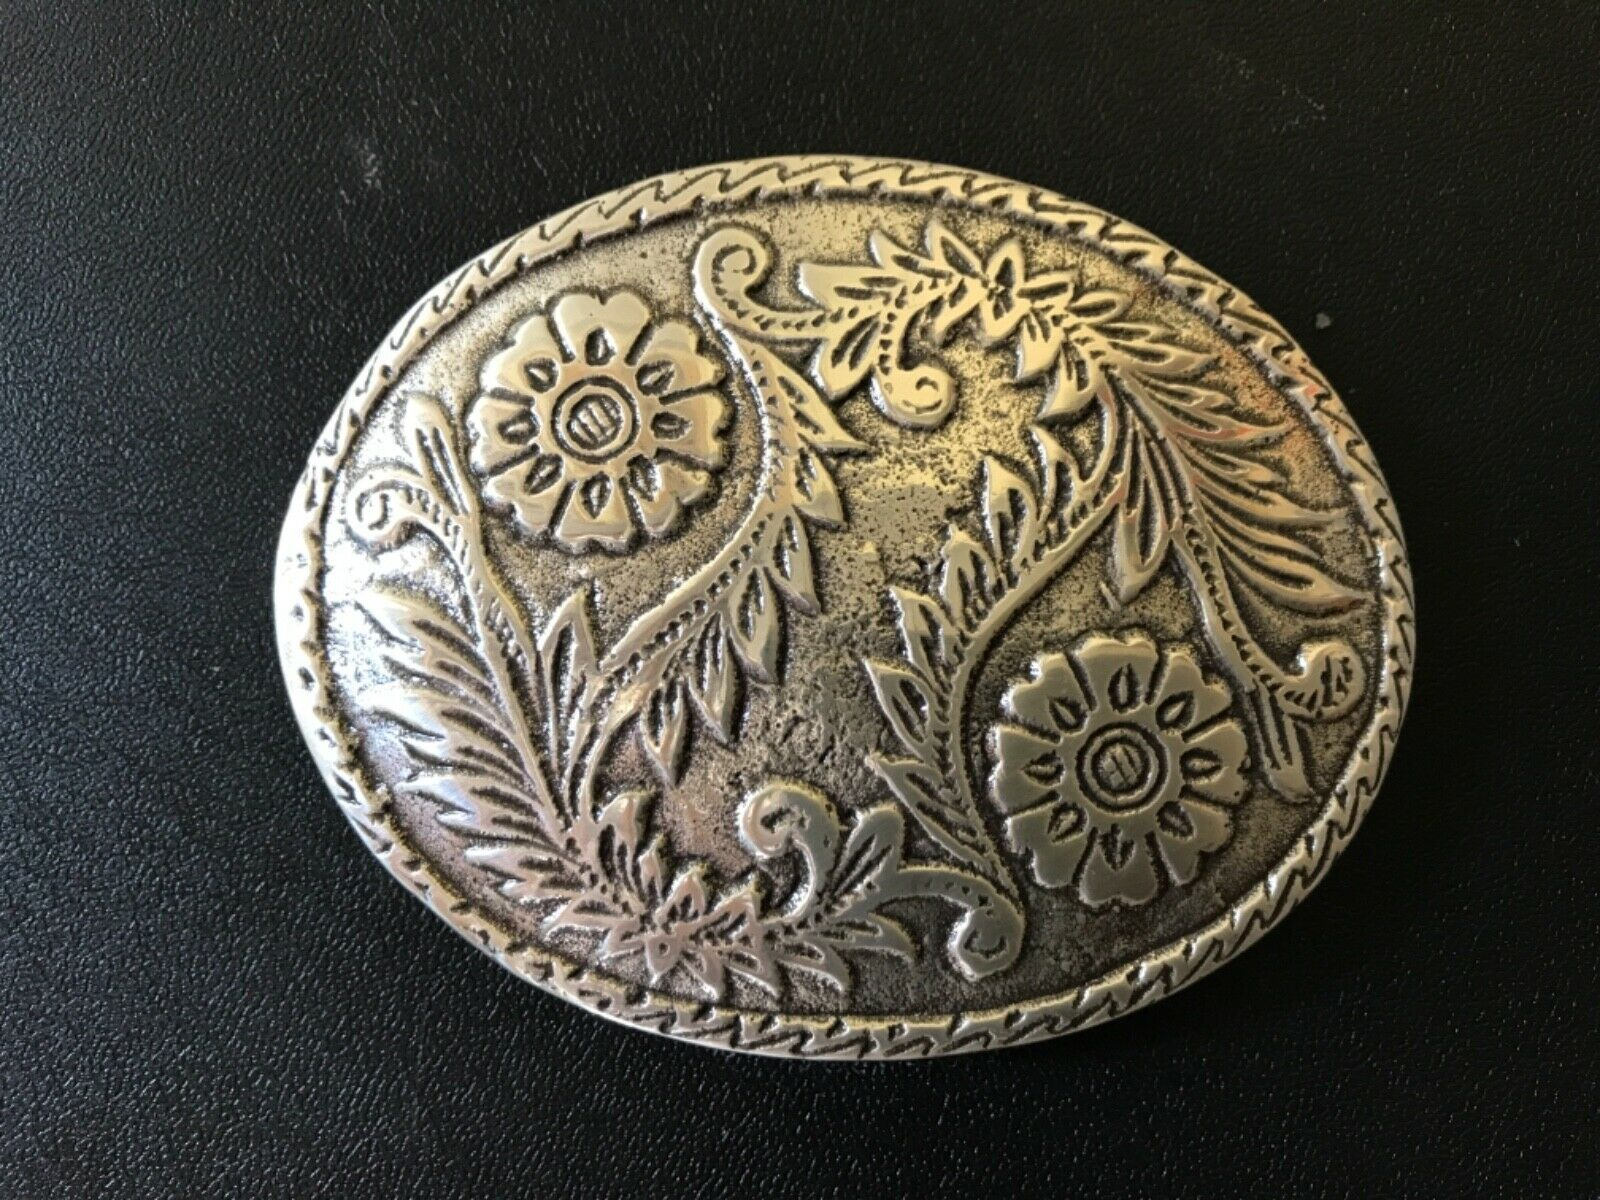 Vintage,Western,oval,floral engraved cowboy,rodeo belt buckle.Silver plaiting.